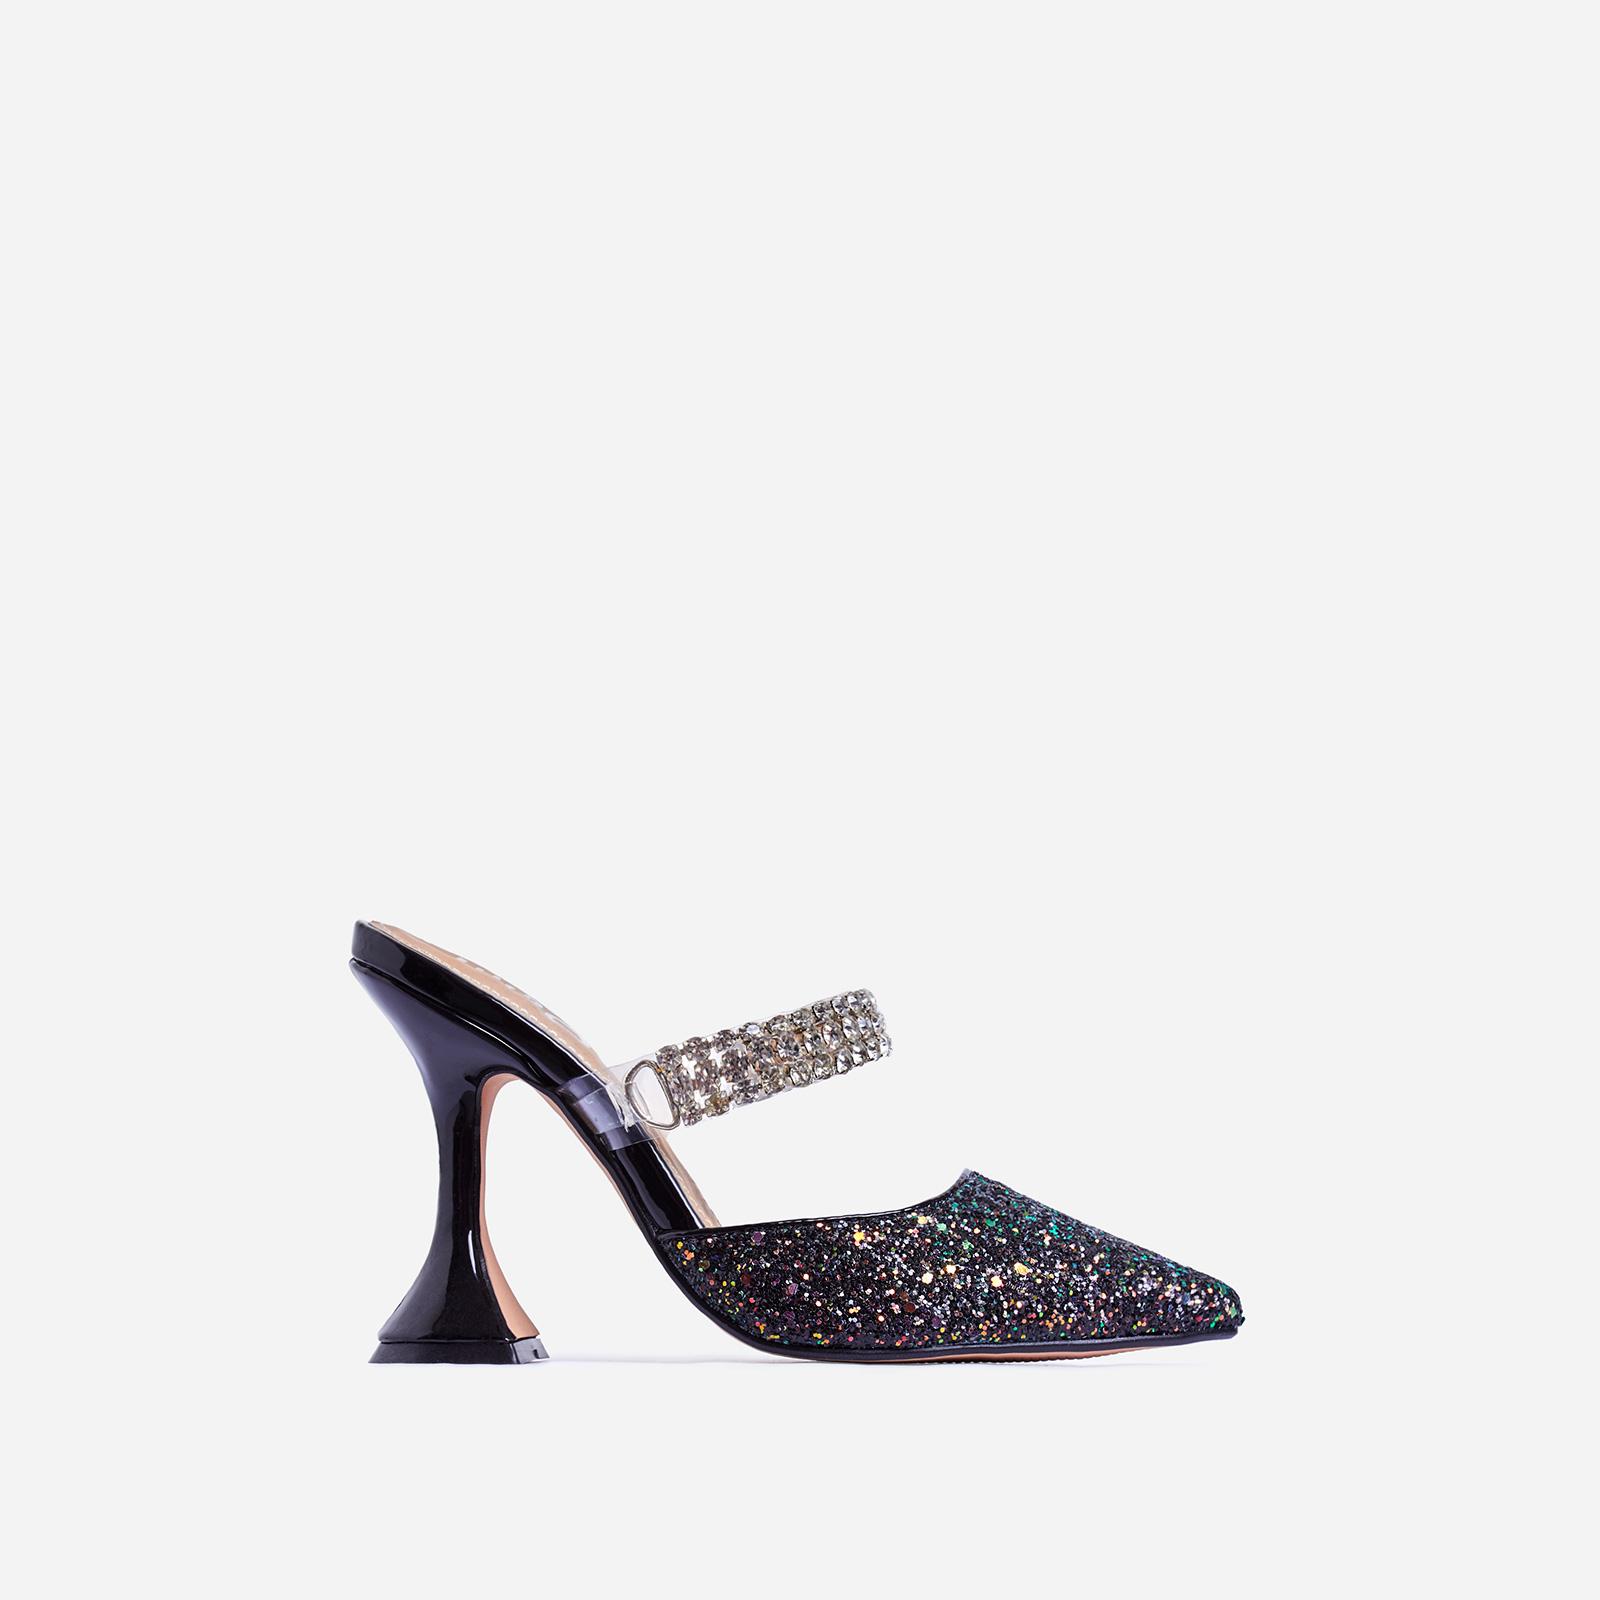 Spice Diamante Detail Pyramid Heel Mule In Black Glitter